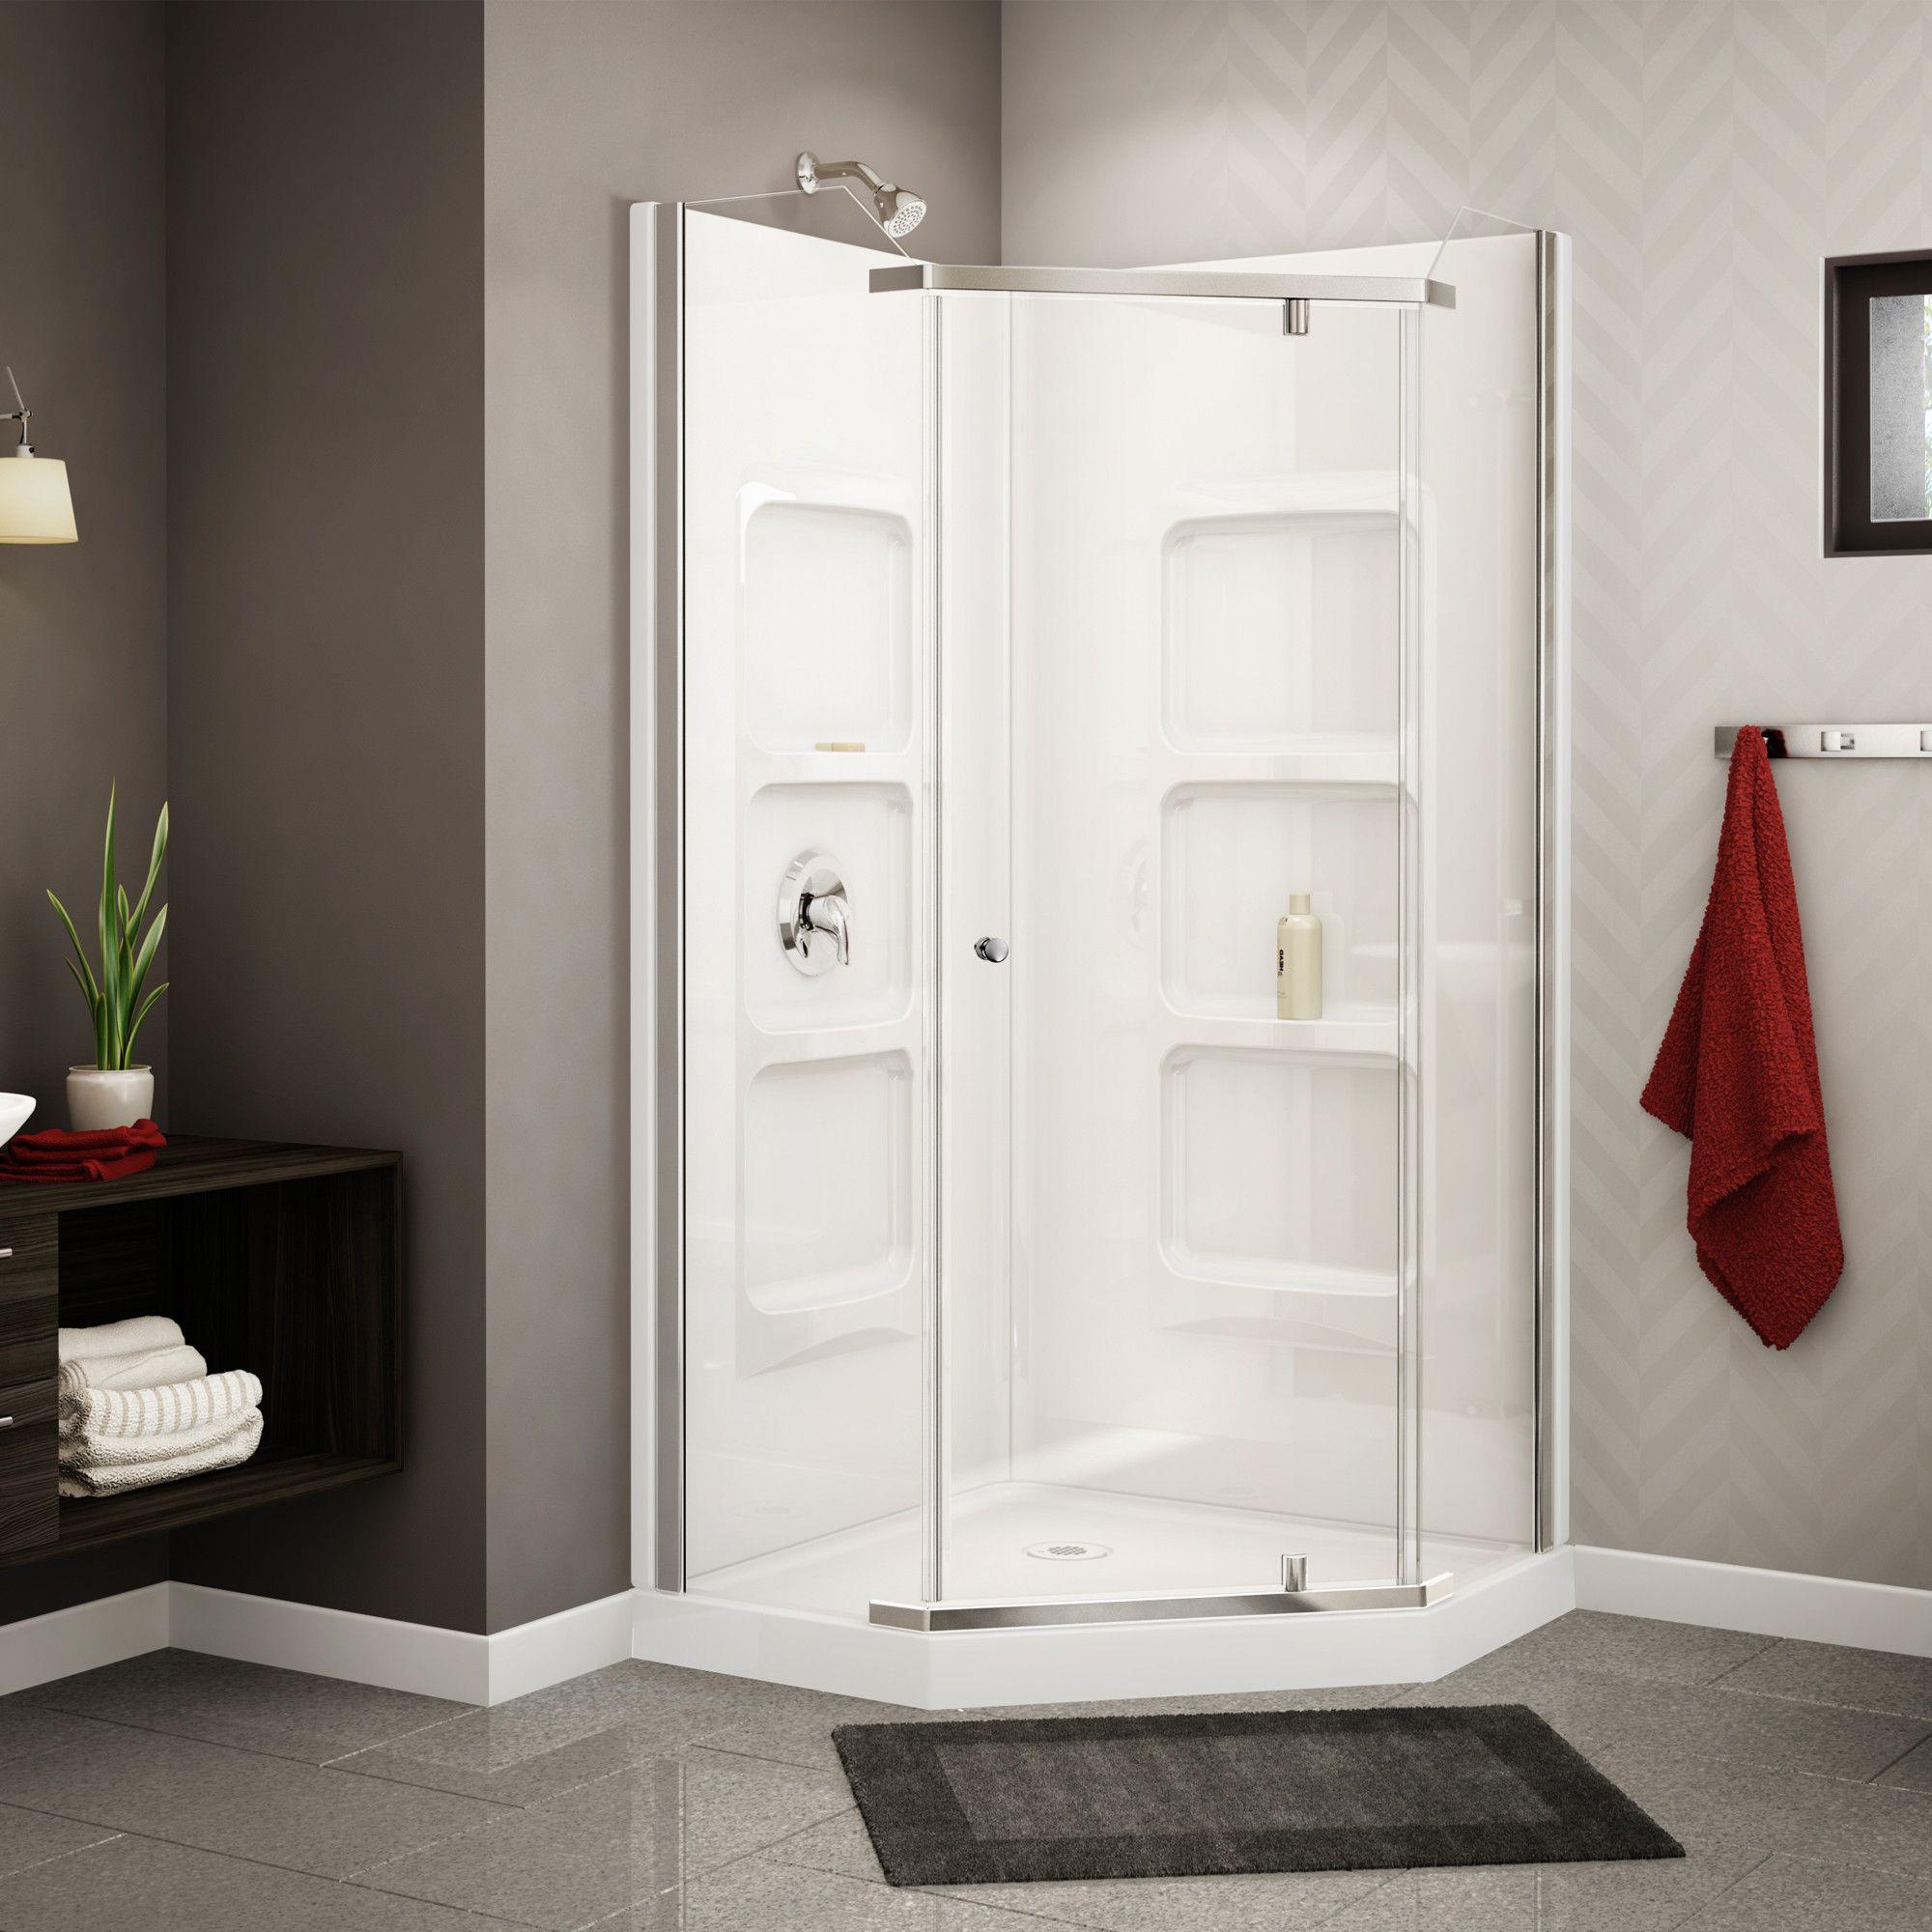 Au0026E Bath And Shower Nevada Neo Angle Corner Shower Set U0026 Reviews | Wayfair